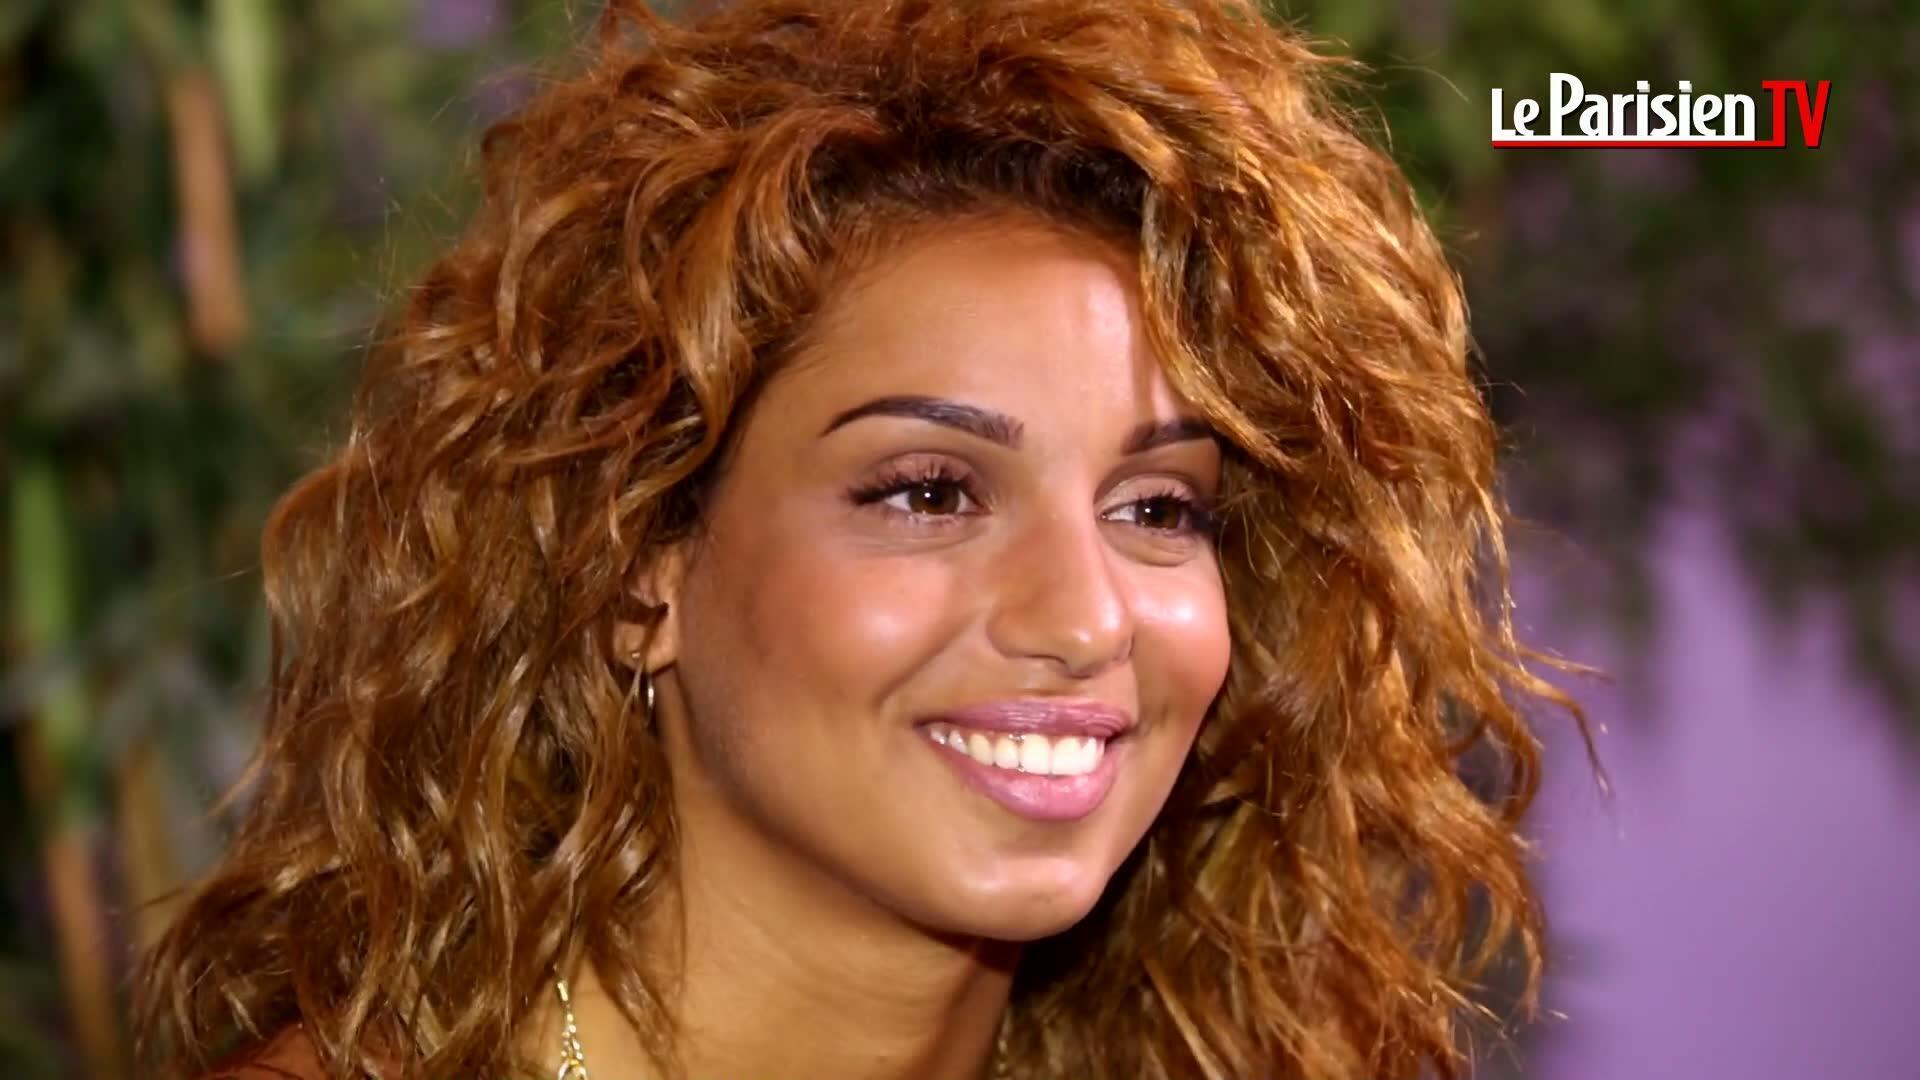 Певица Тал - интервью изданию Le Parisien